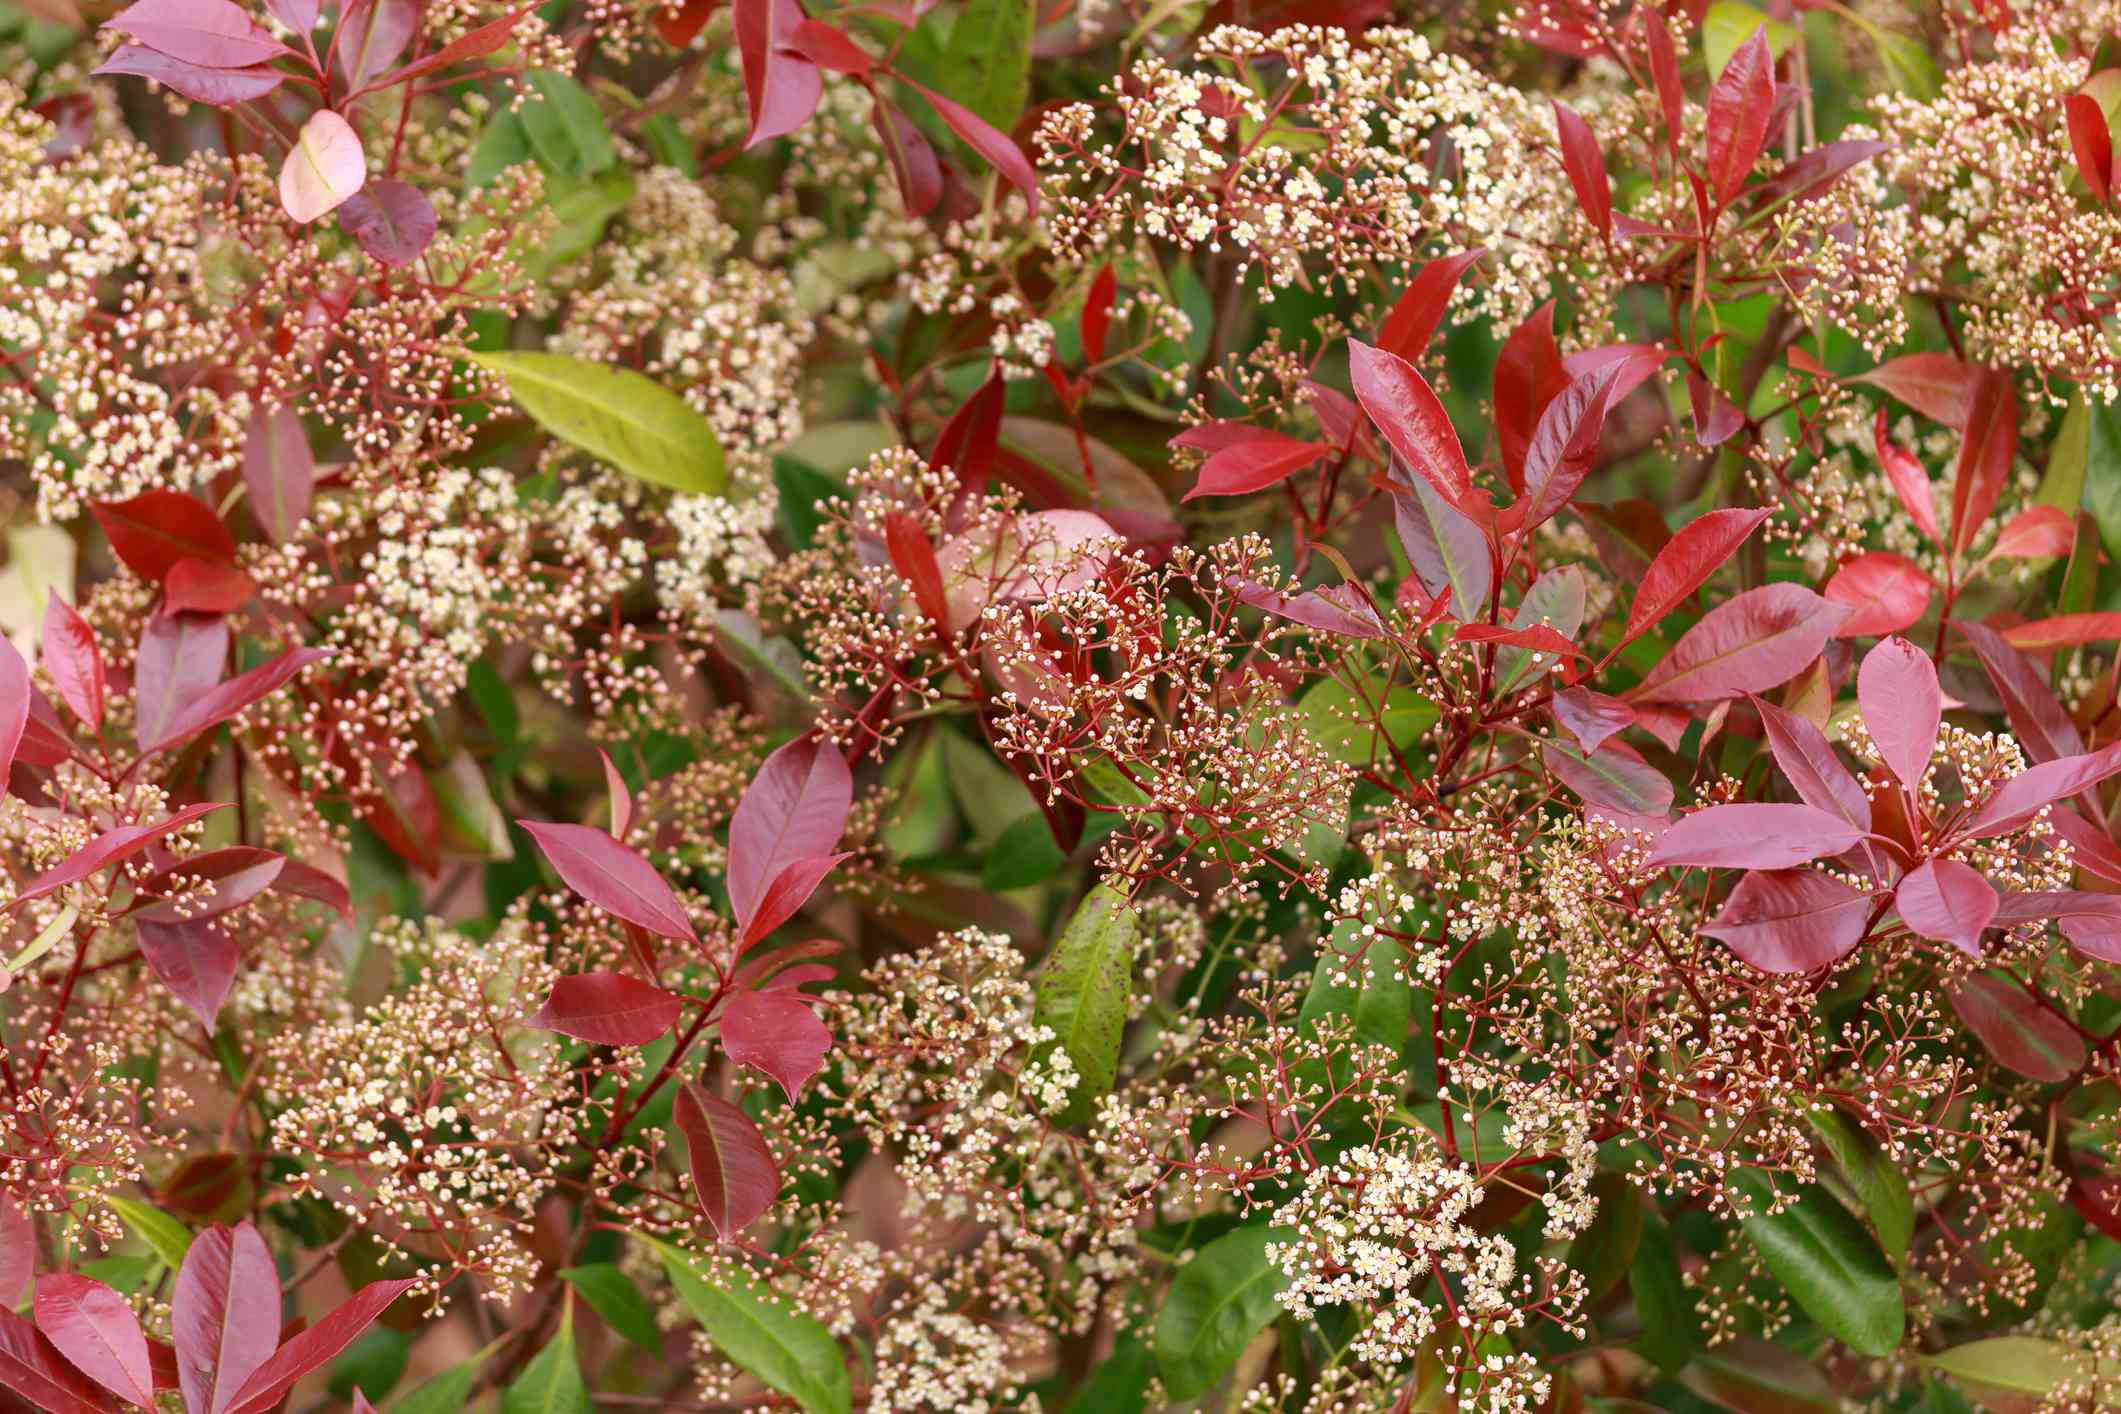 'Red Robin' hedge